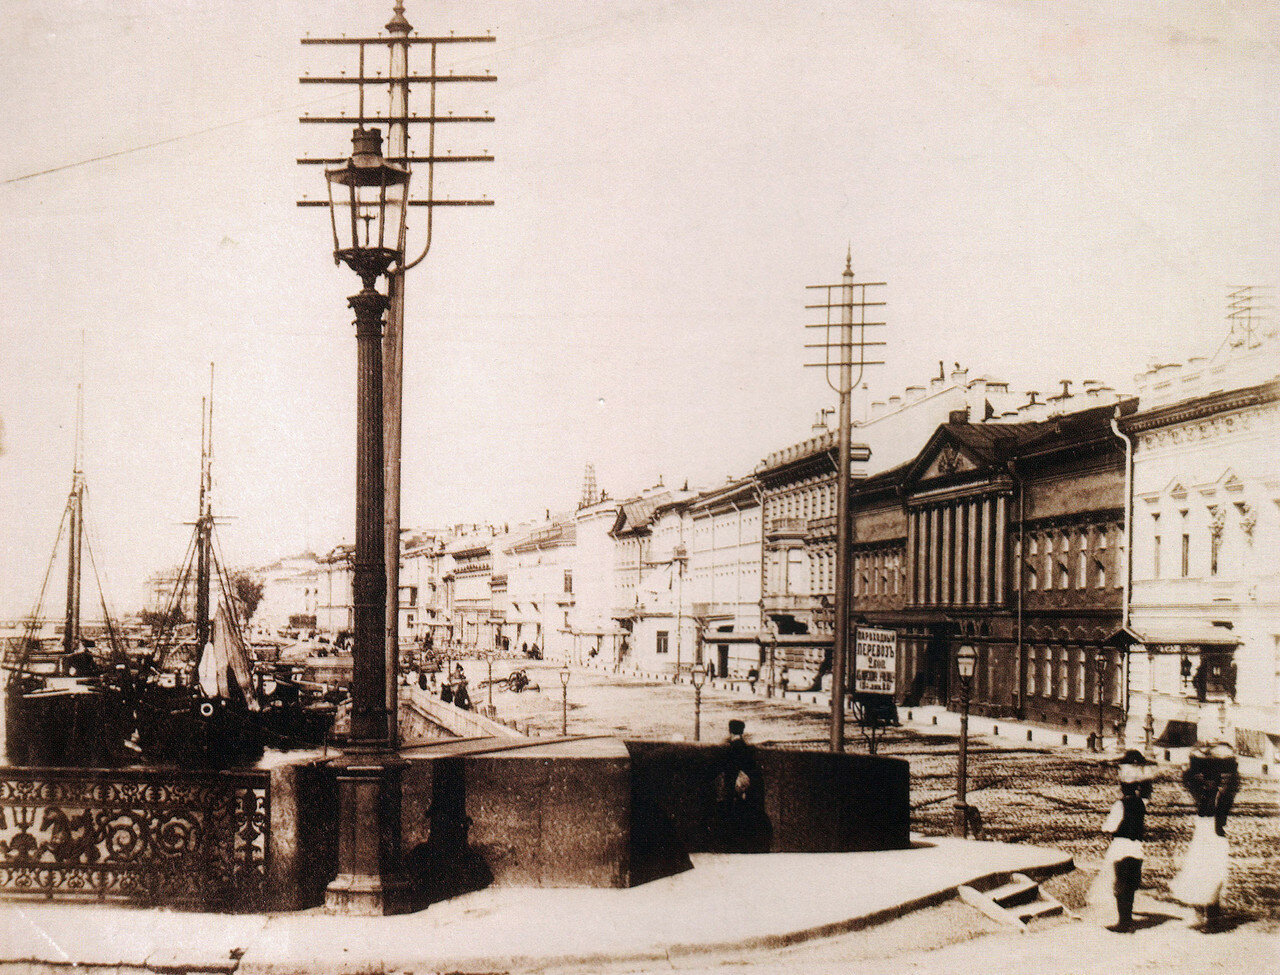 Николаевский мост и вид на Английскую набережную. 1880-е